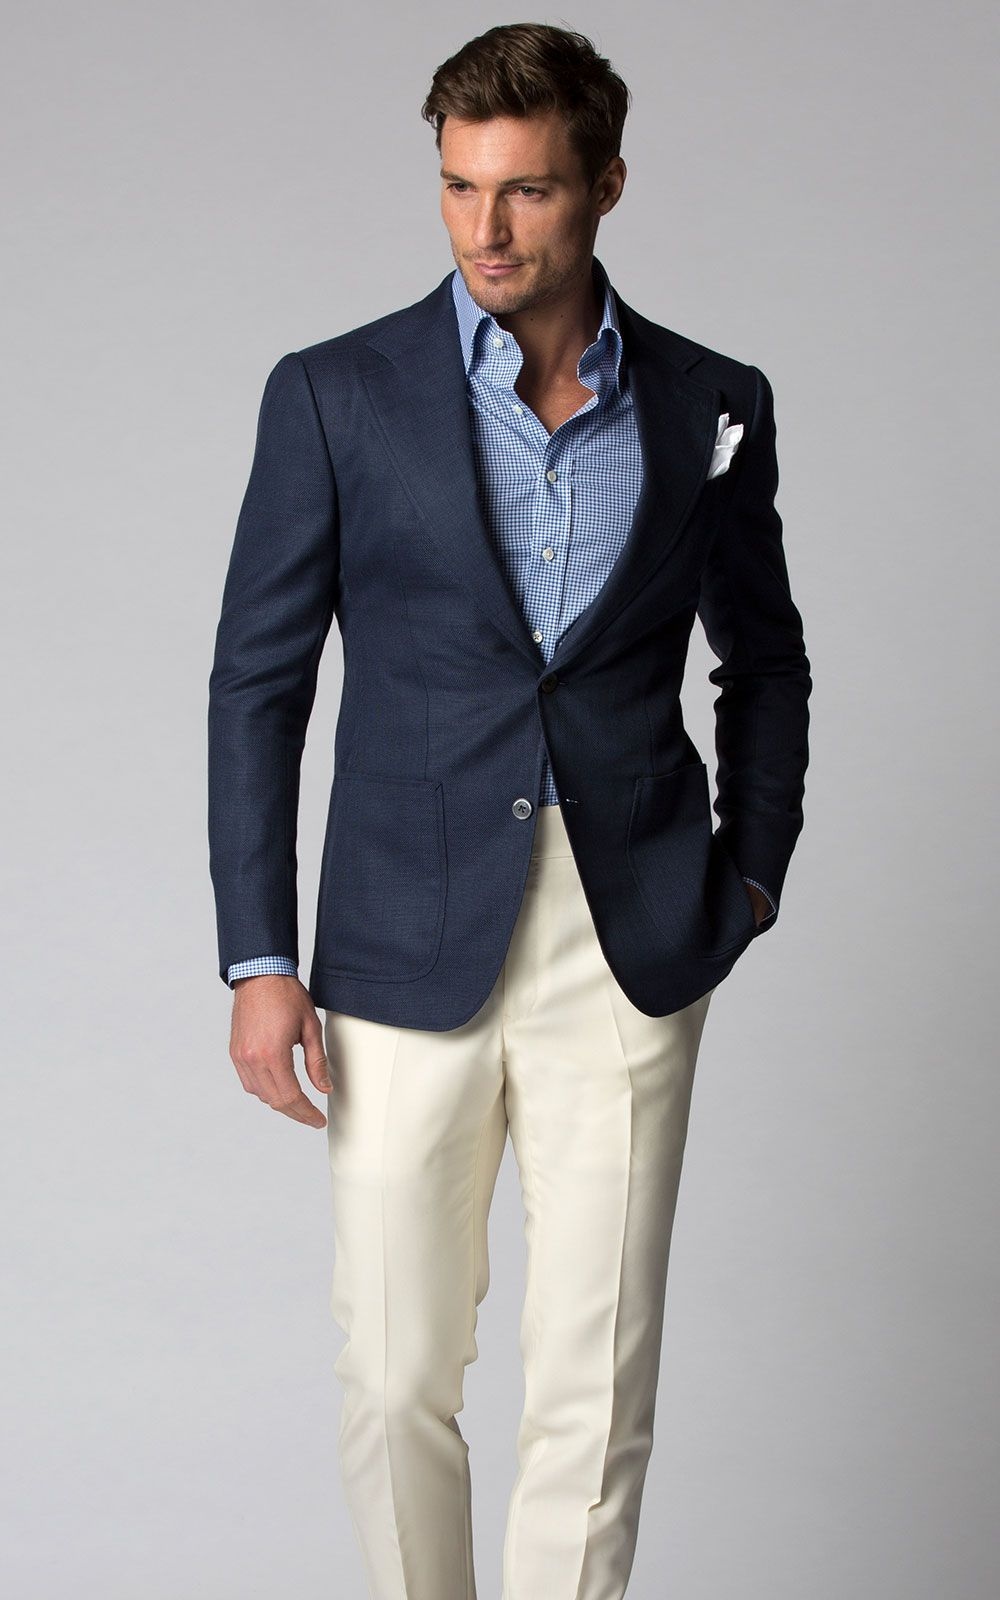 outfits de trabajo para hombres